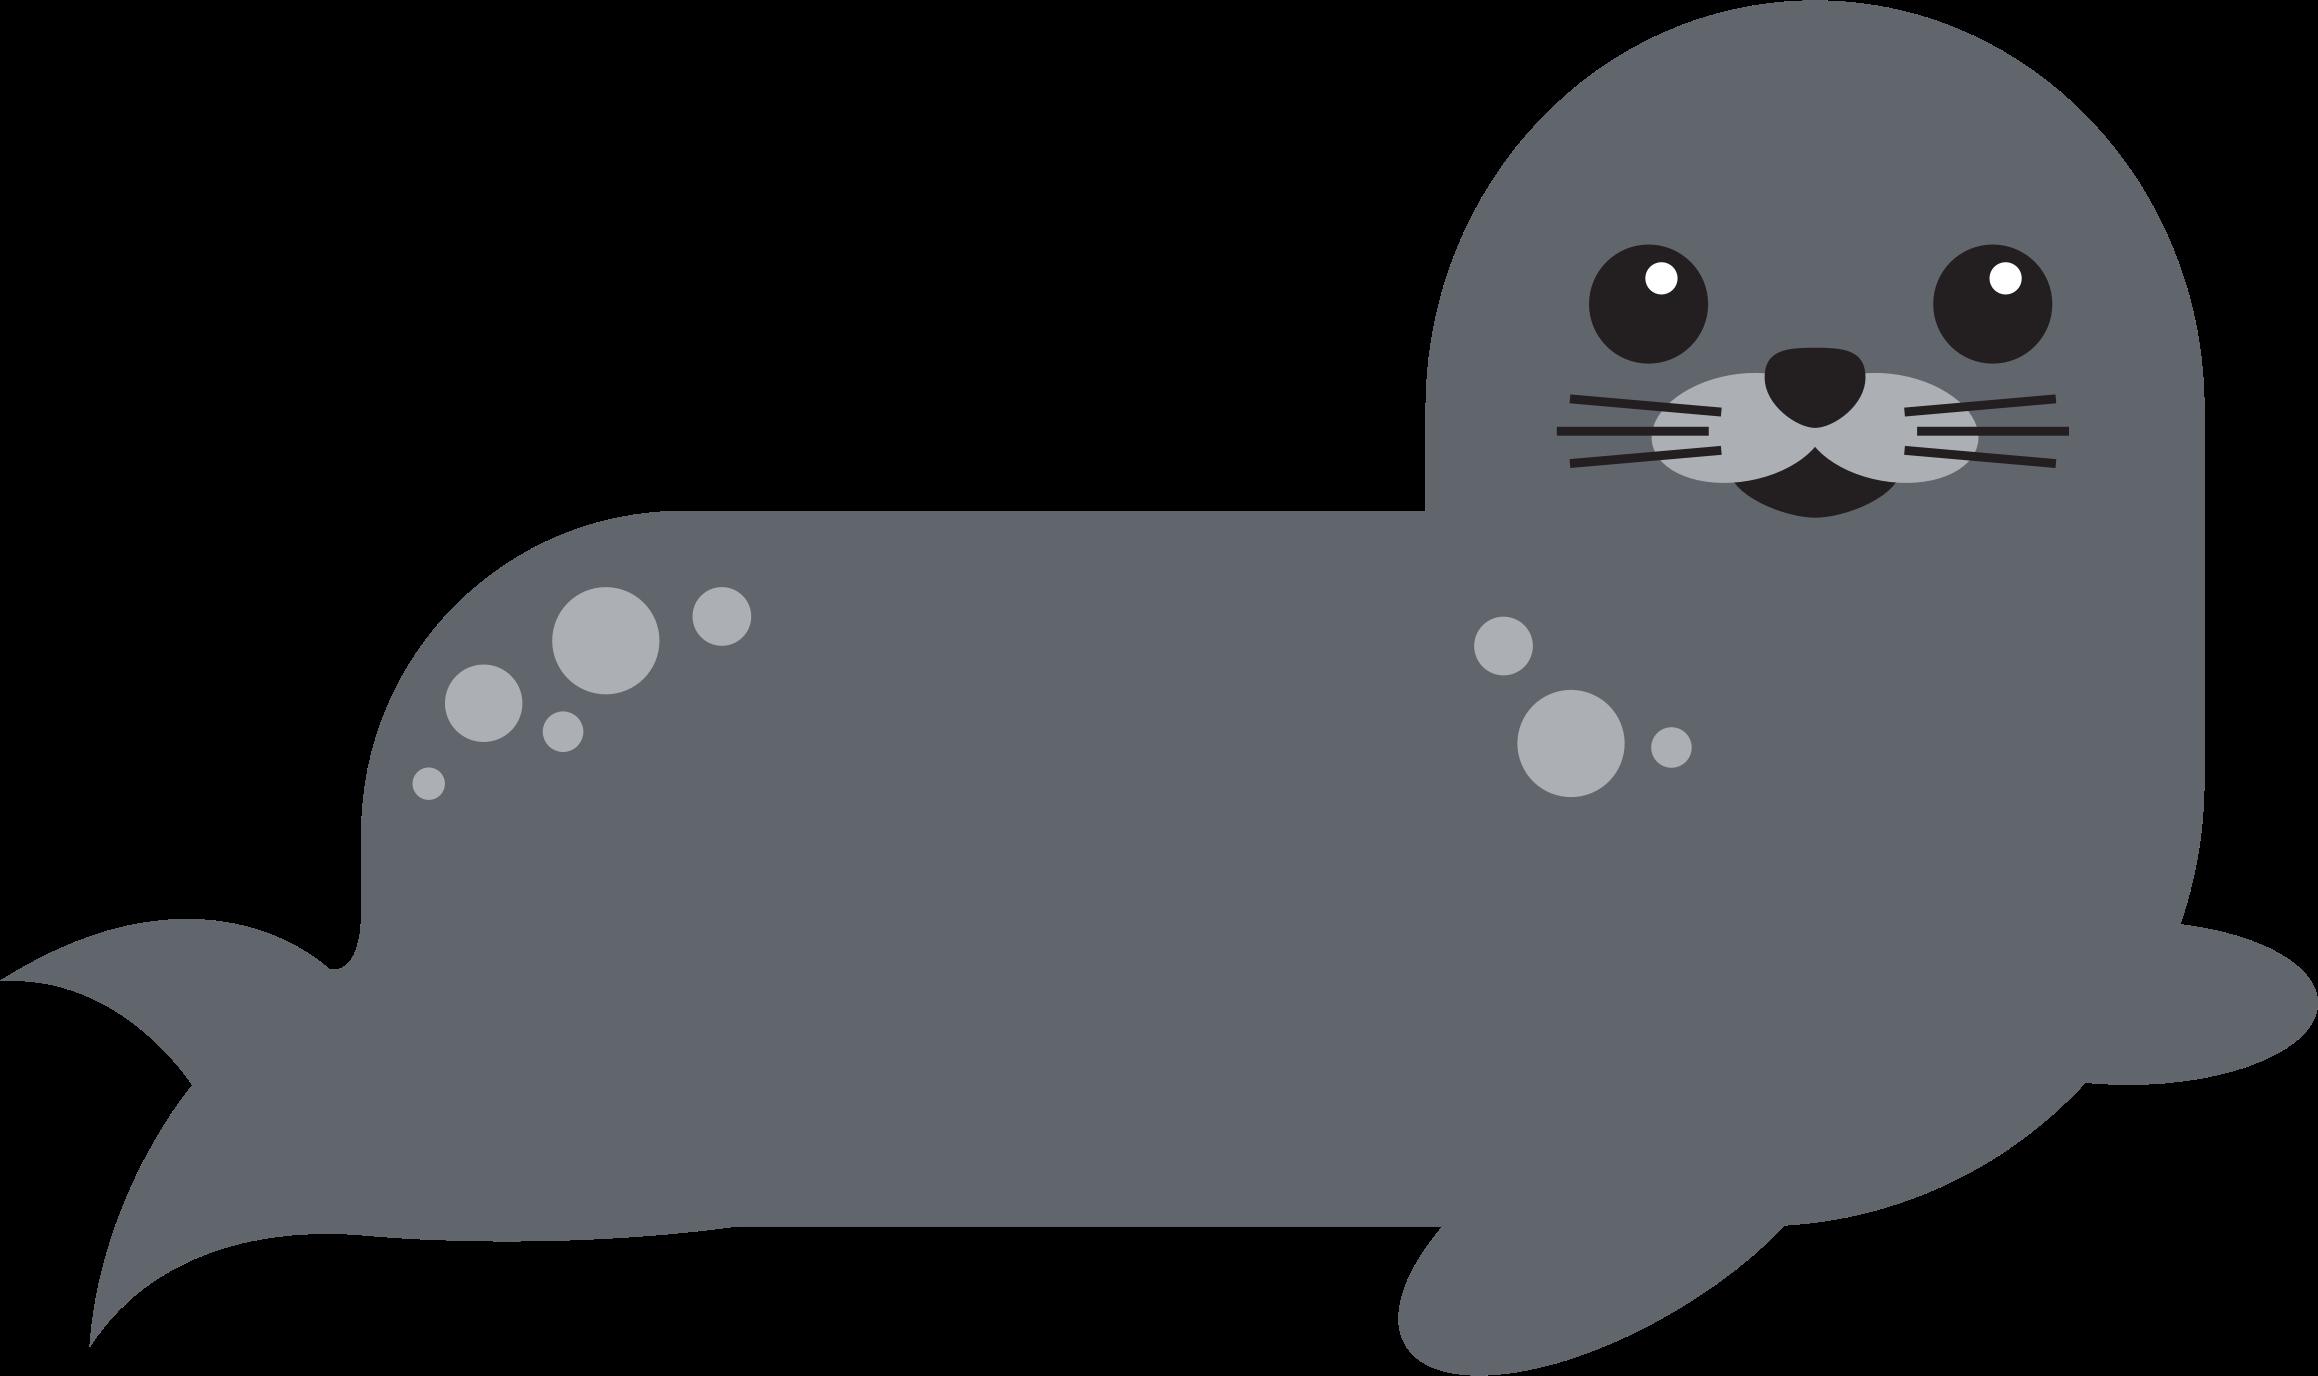 Walrus clipart swimming. Harbor seal big image